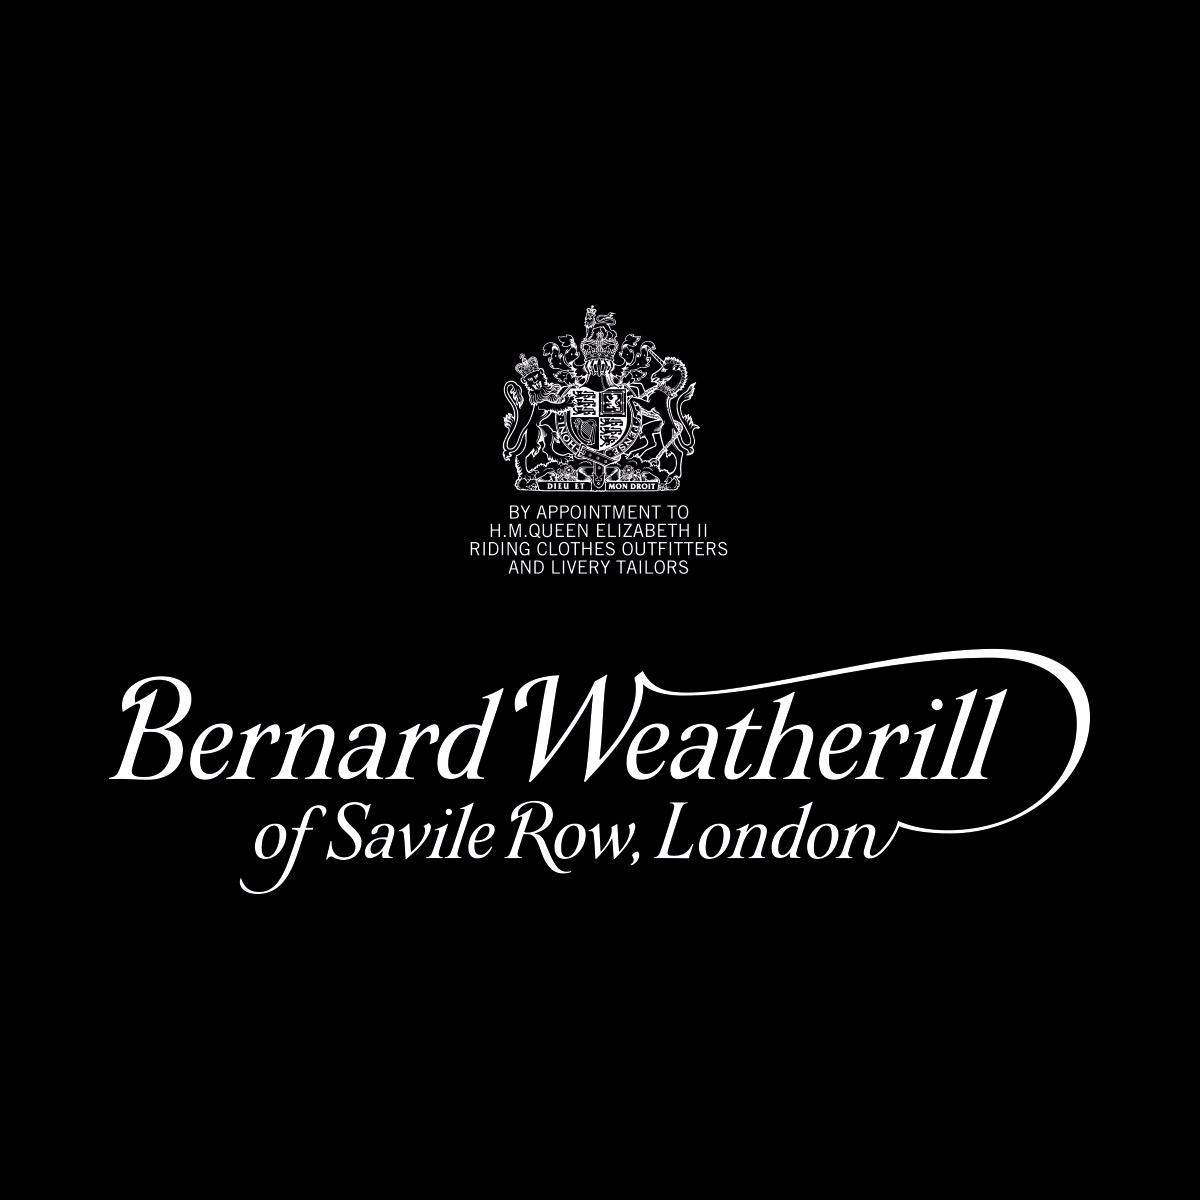 BERNARD-WEATHERILL